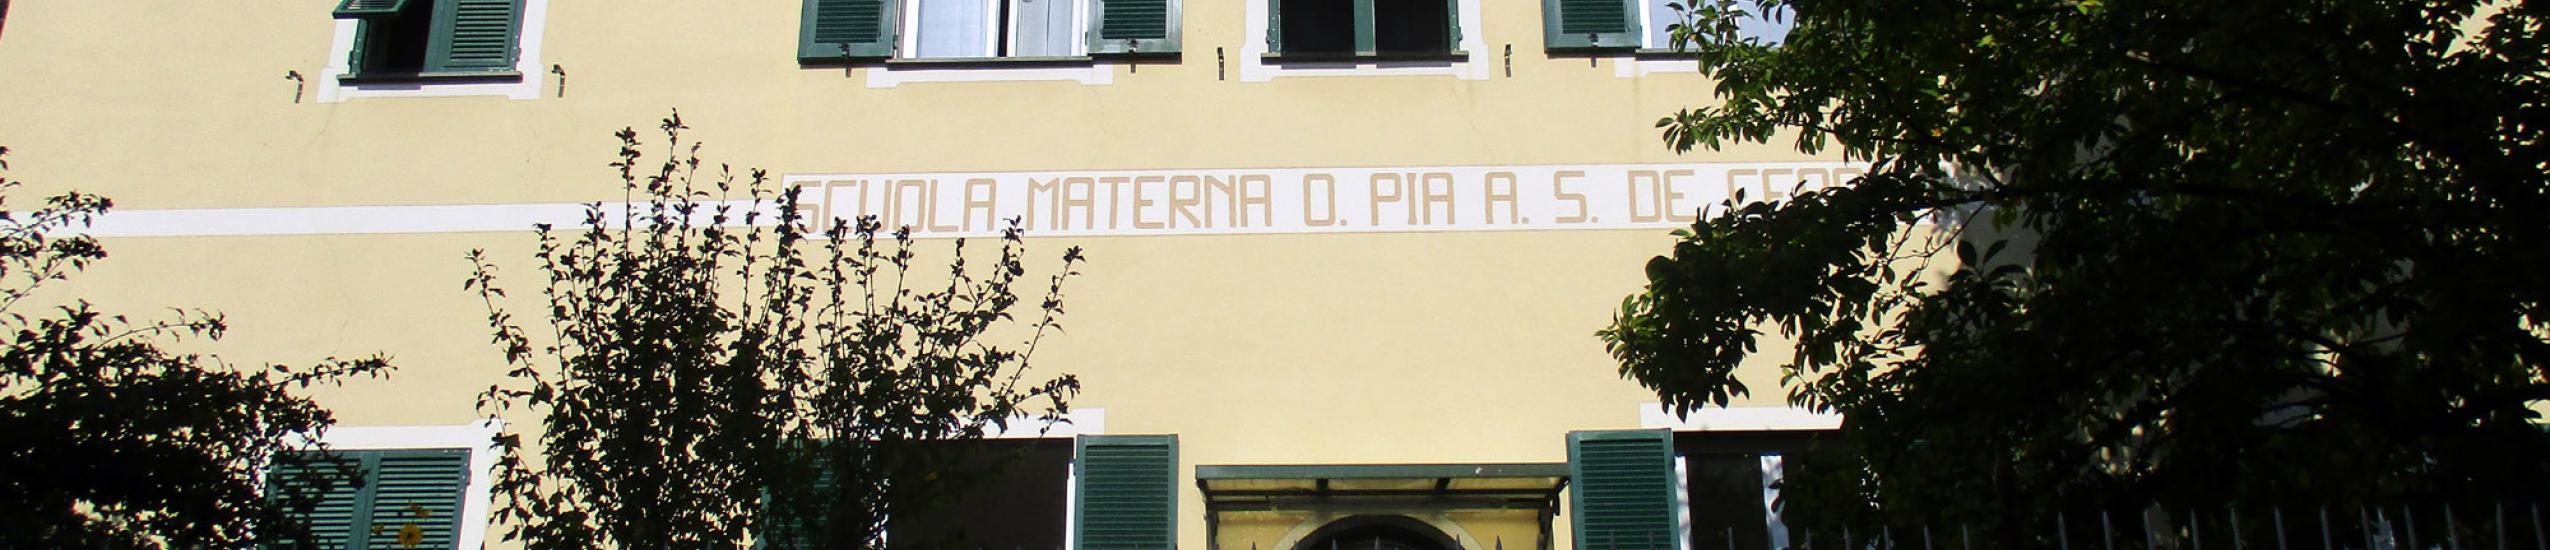 Scuola Materna Opera Pia A.S. De Ferrari